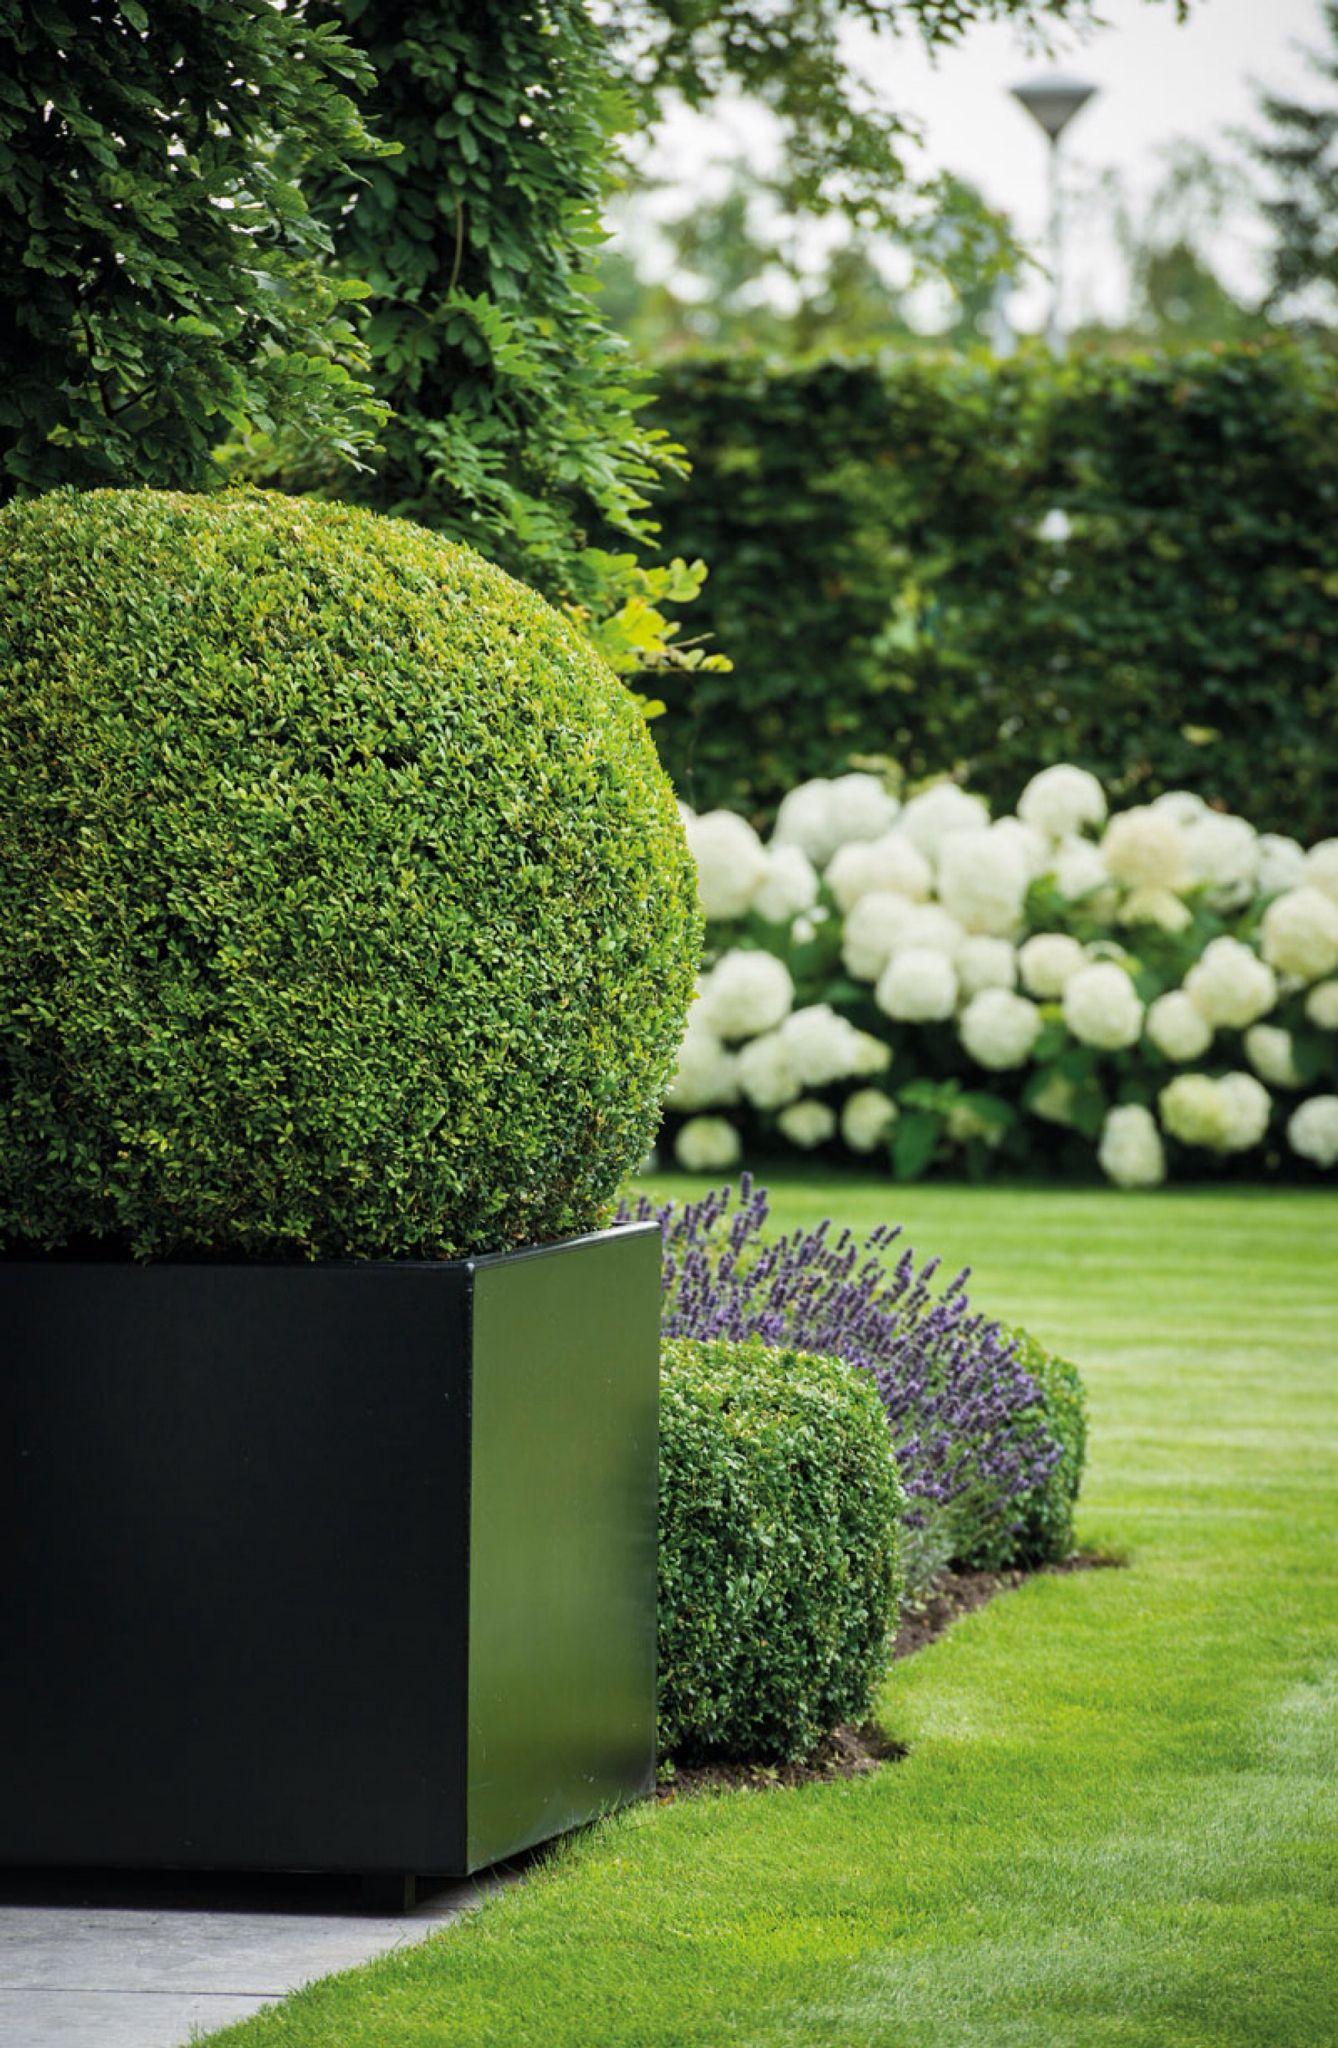 Lavendel hortensien garten landschaftsplanungbuchsbaumgartenpflanzenbepflanzungbalkongärtenmoderne